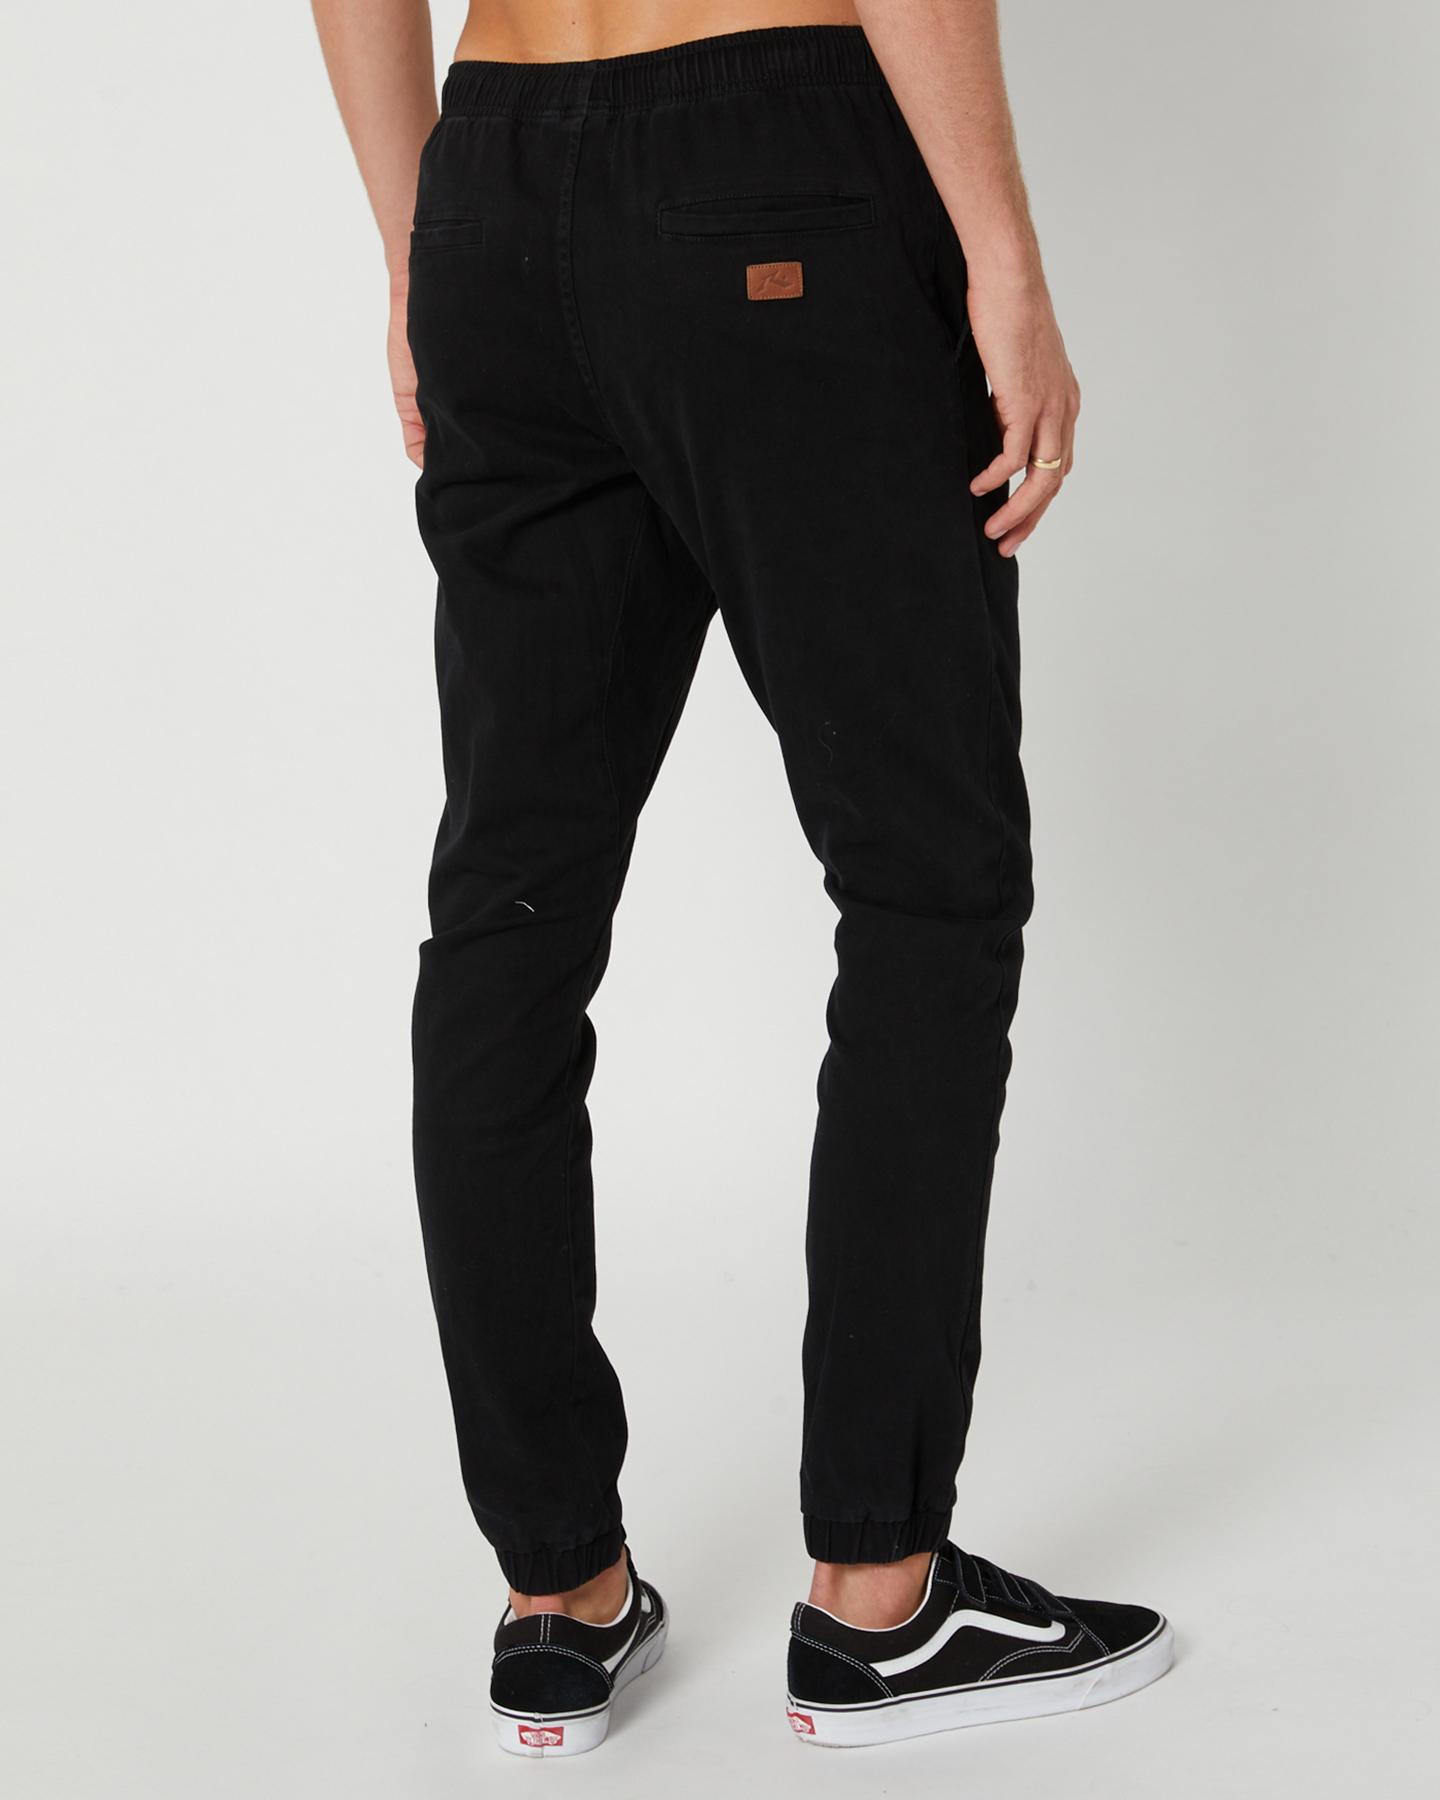 New-Rusty-Men-039-s-Hook-Out-Mens-Jogger-Pant-Cotton-Spandex-Blue thumbnail 9